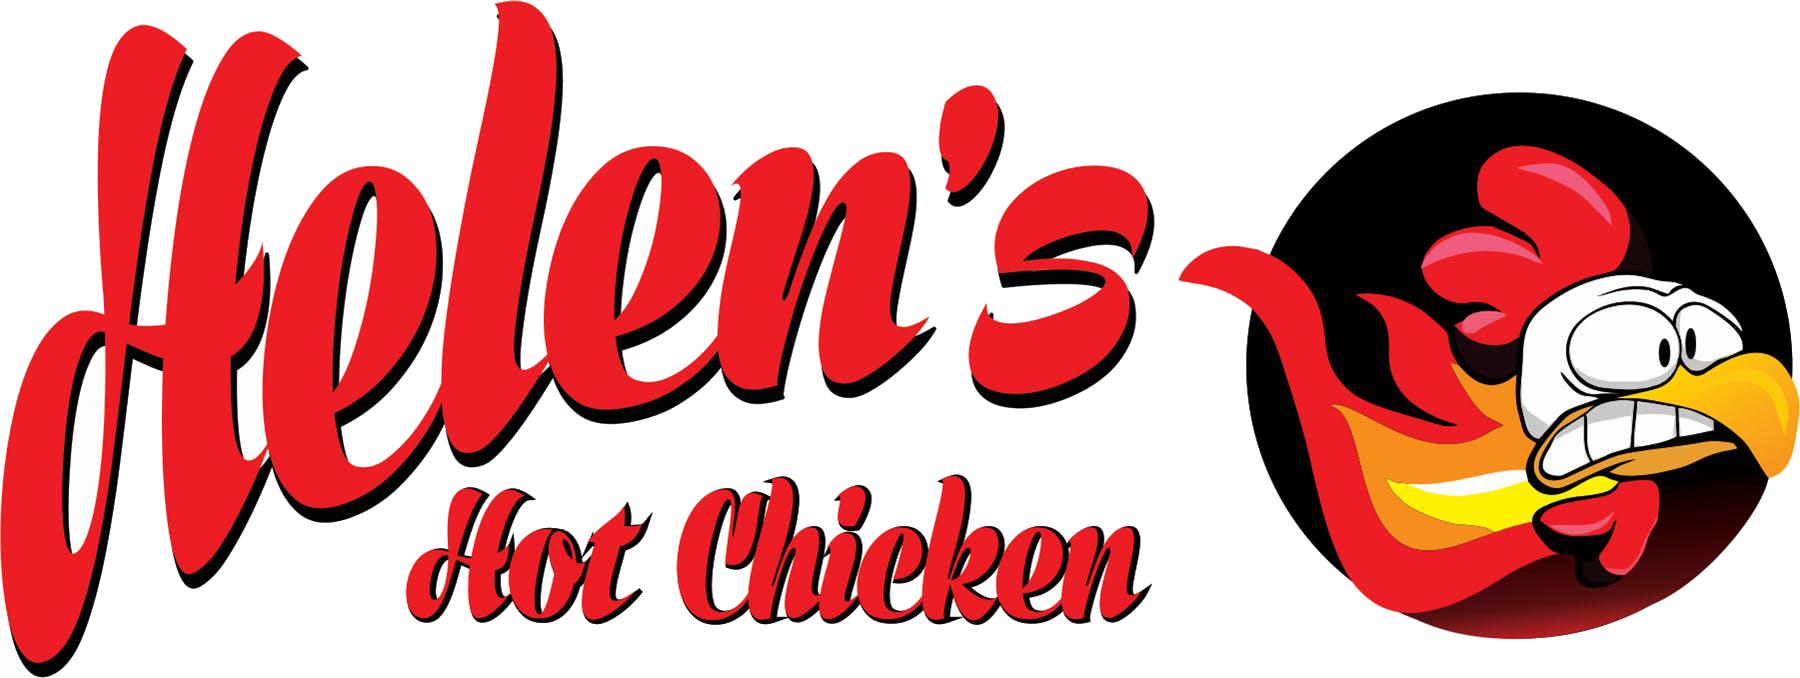 Helen's Hot Chicken Home